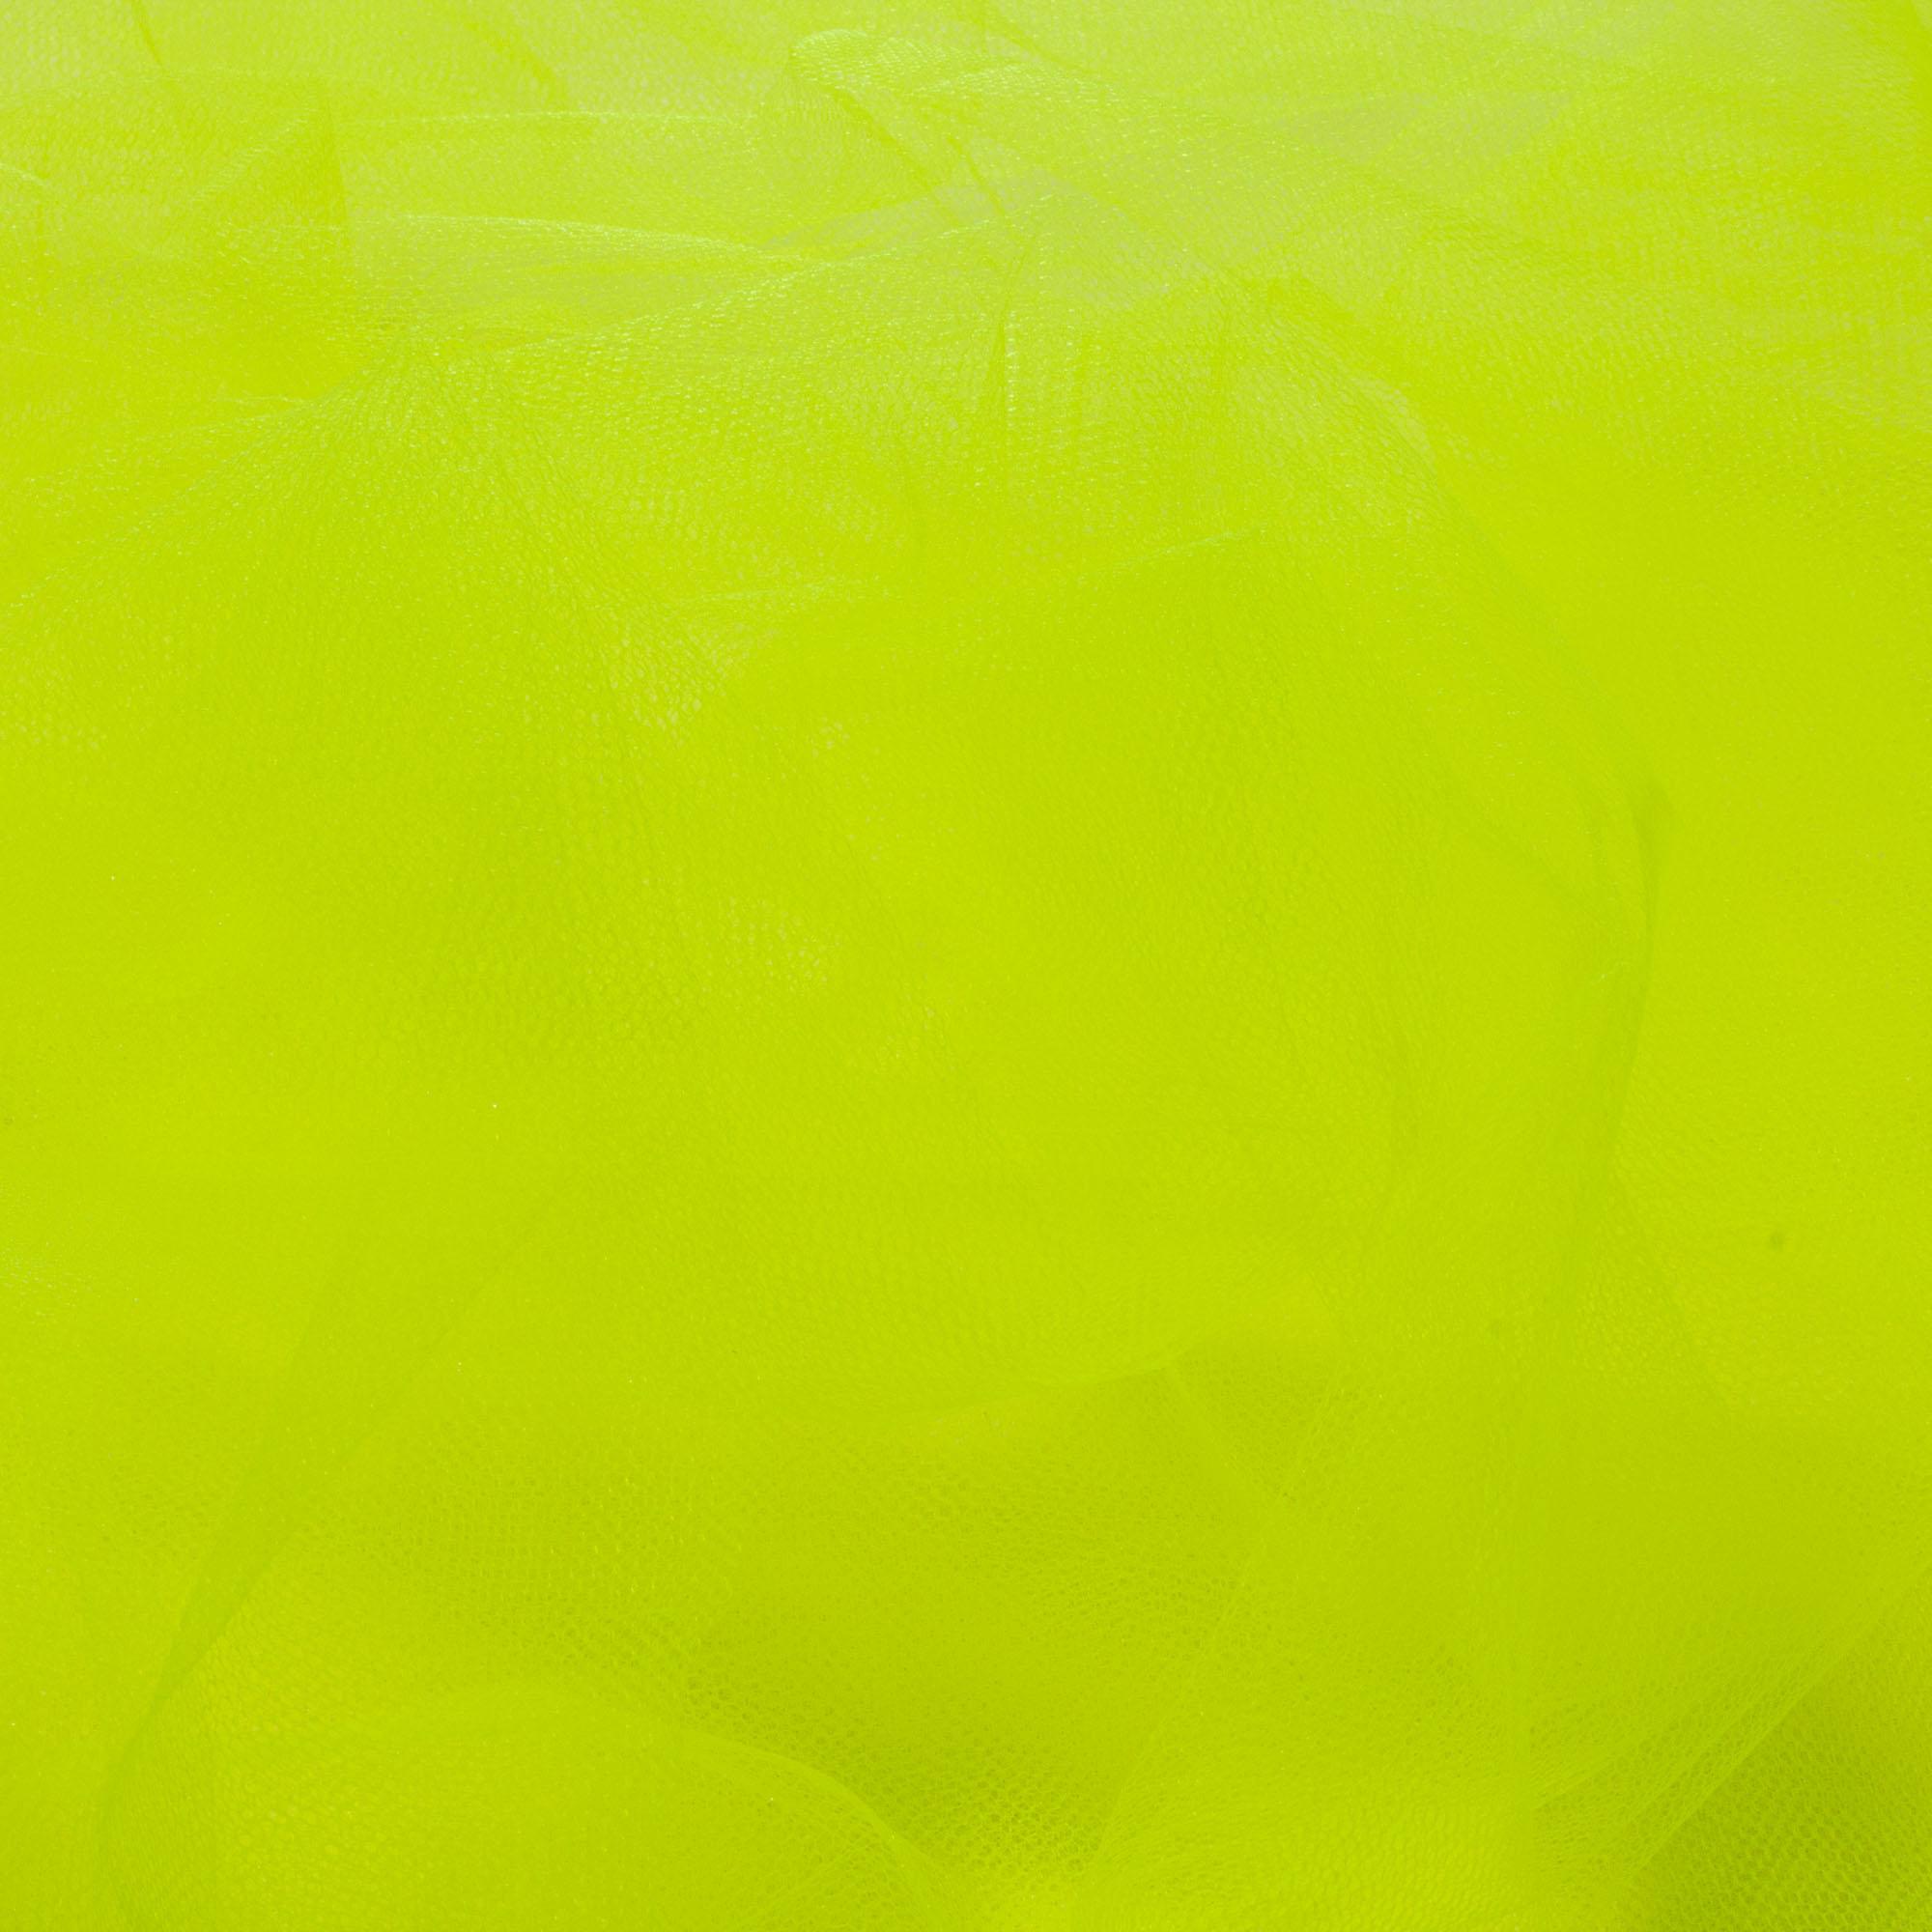 10 Metros Tecido Tule 1,20 Mt Largura Amarelo Limão